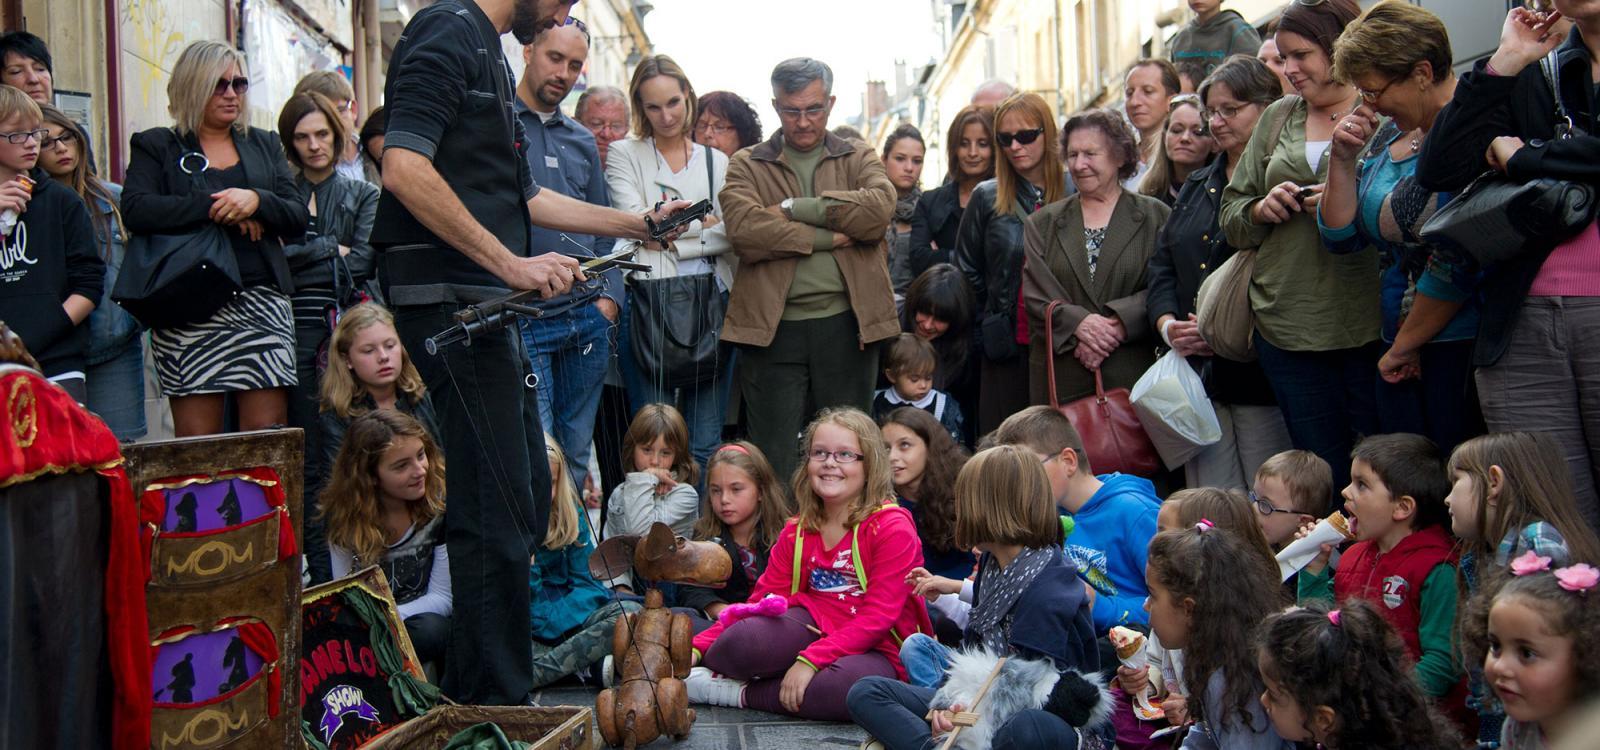 Festival-Marionnettes-2013-©-David-Truillard-(23)